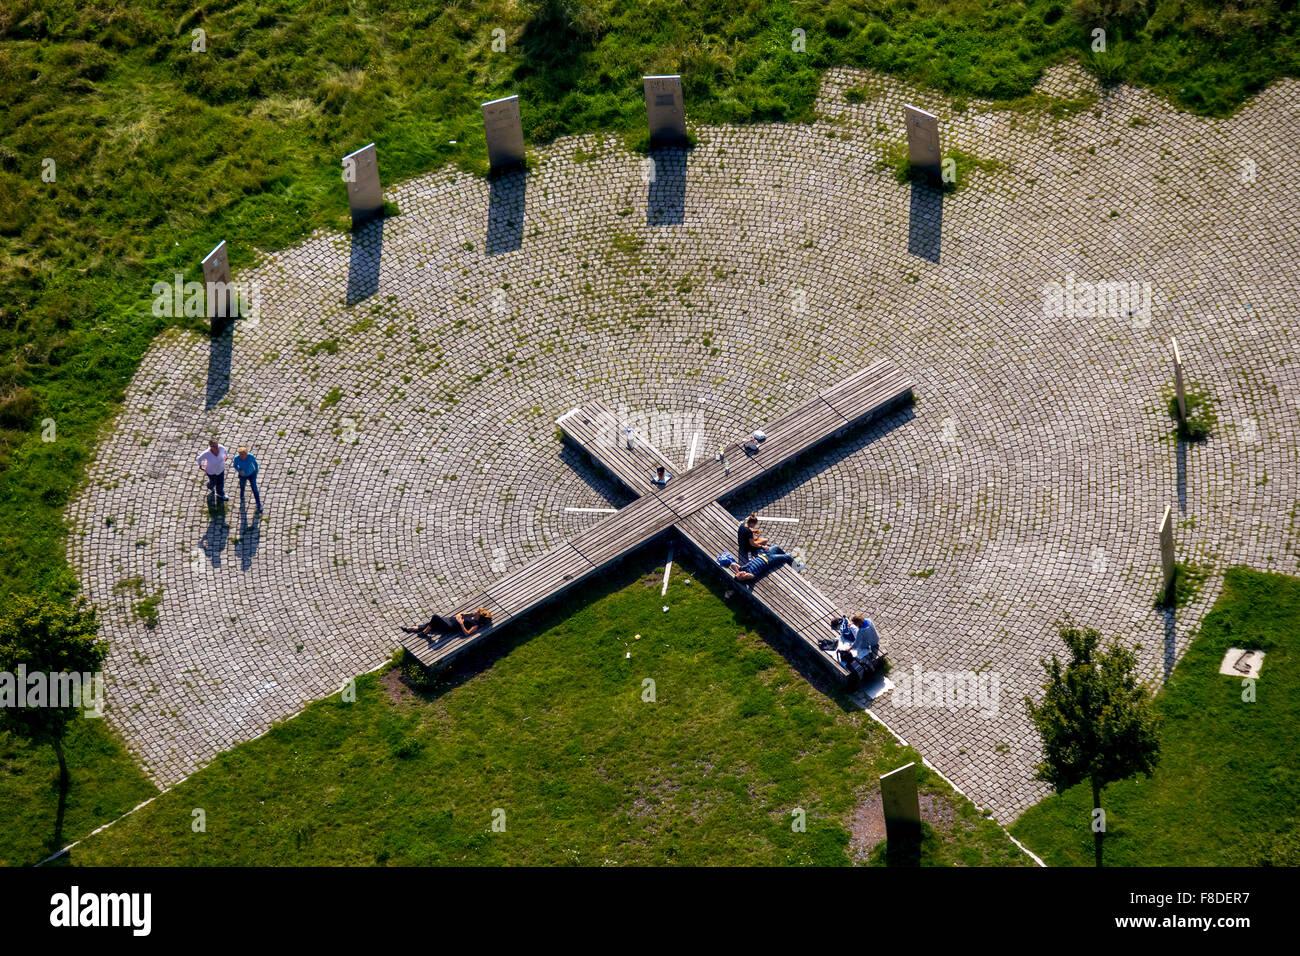 Tippelsberg with summit cross, Bochum, Ruhr area, North Rhine-Westphalia, Germany, Europe, Aerial view, birds-eyes - Stock Image